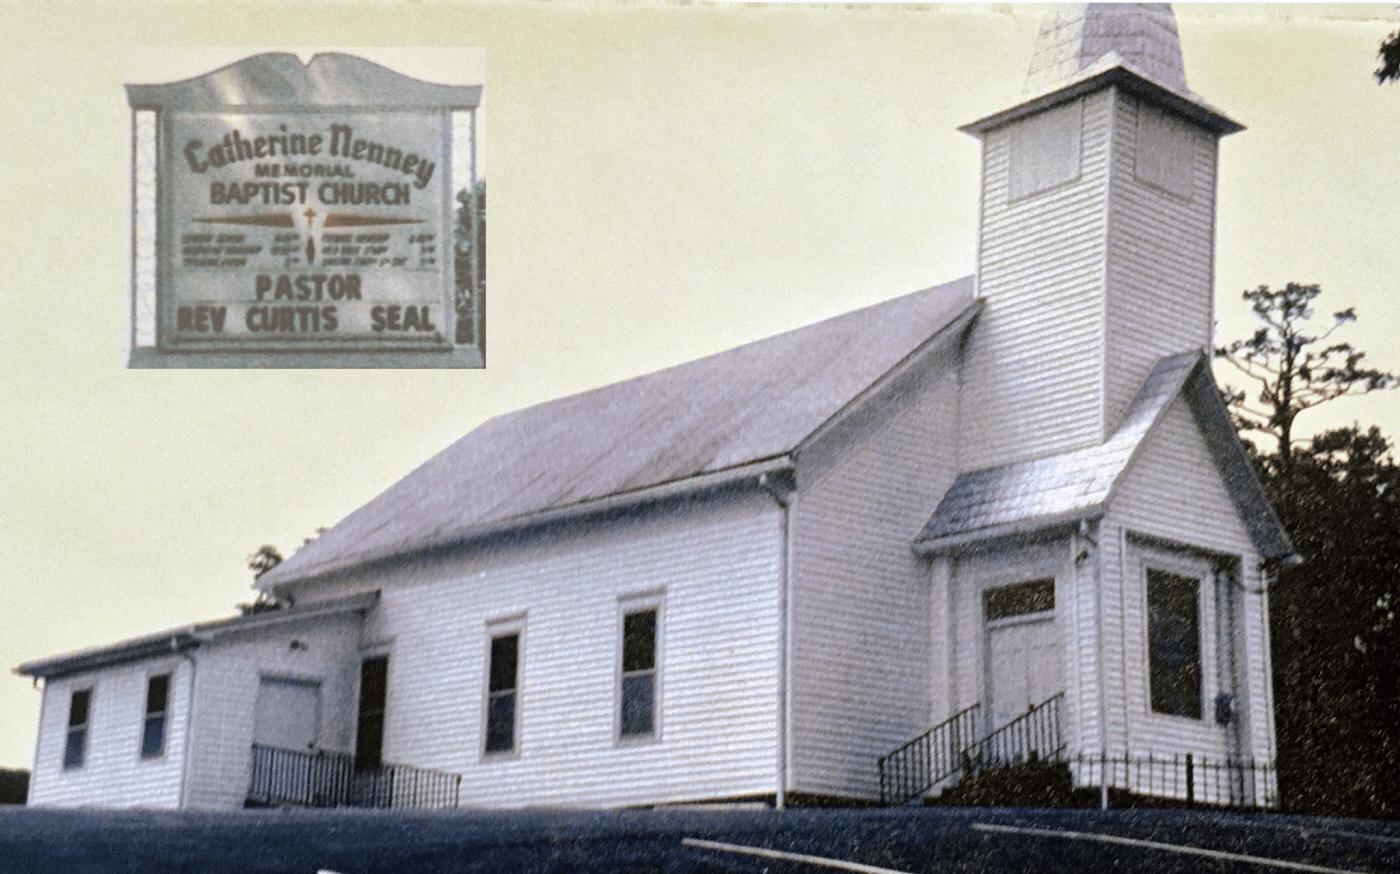 Catherine Nenney Baptist Church in Whitesburg, TN